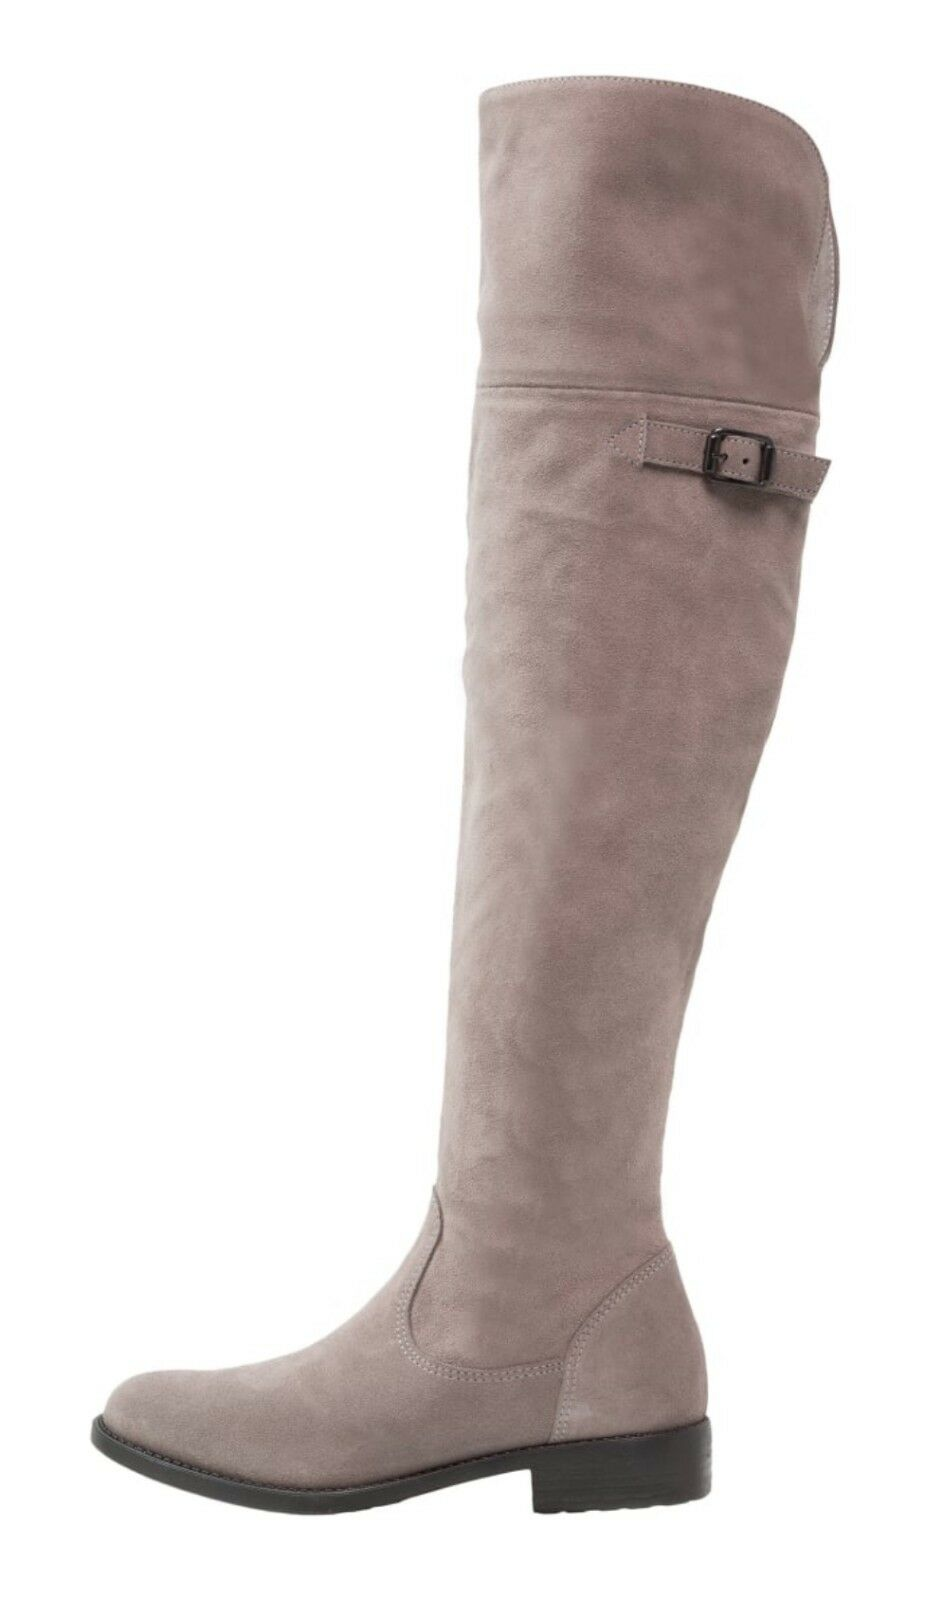 Modischer Stiefel Tamaris Damen, Grau, Leder, Overknees